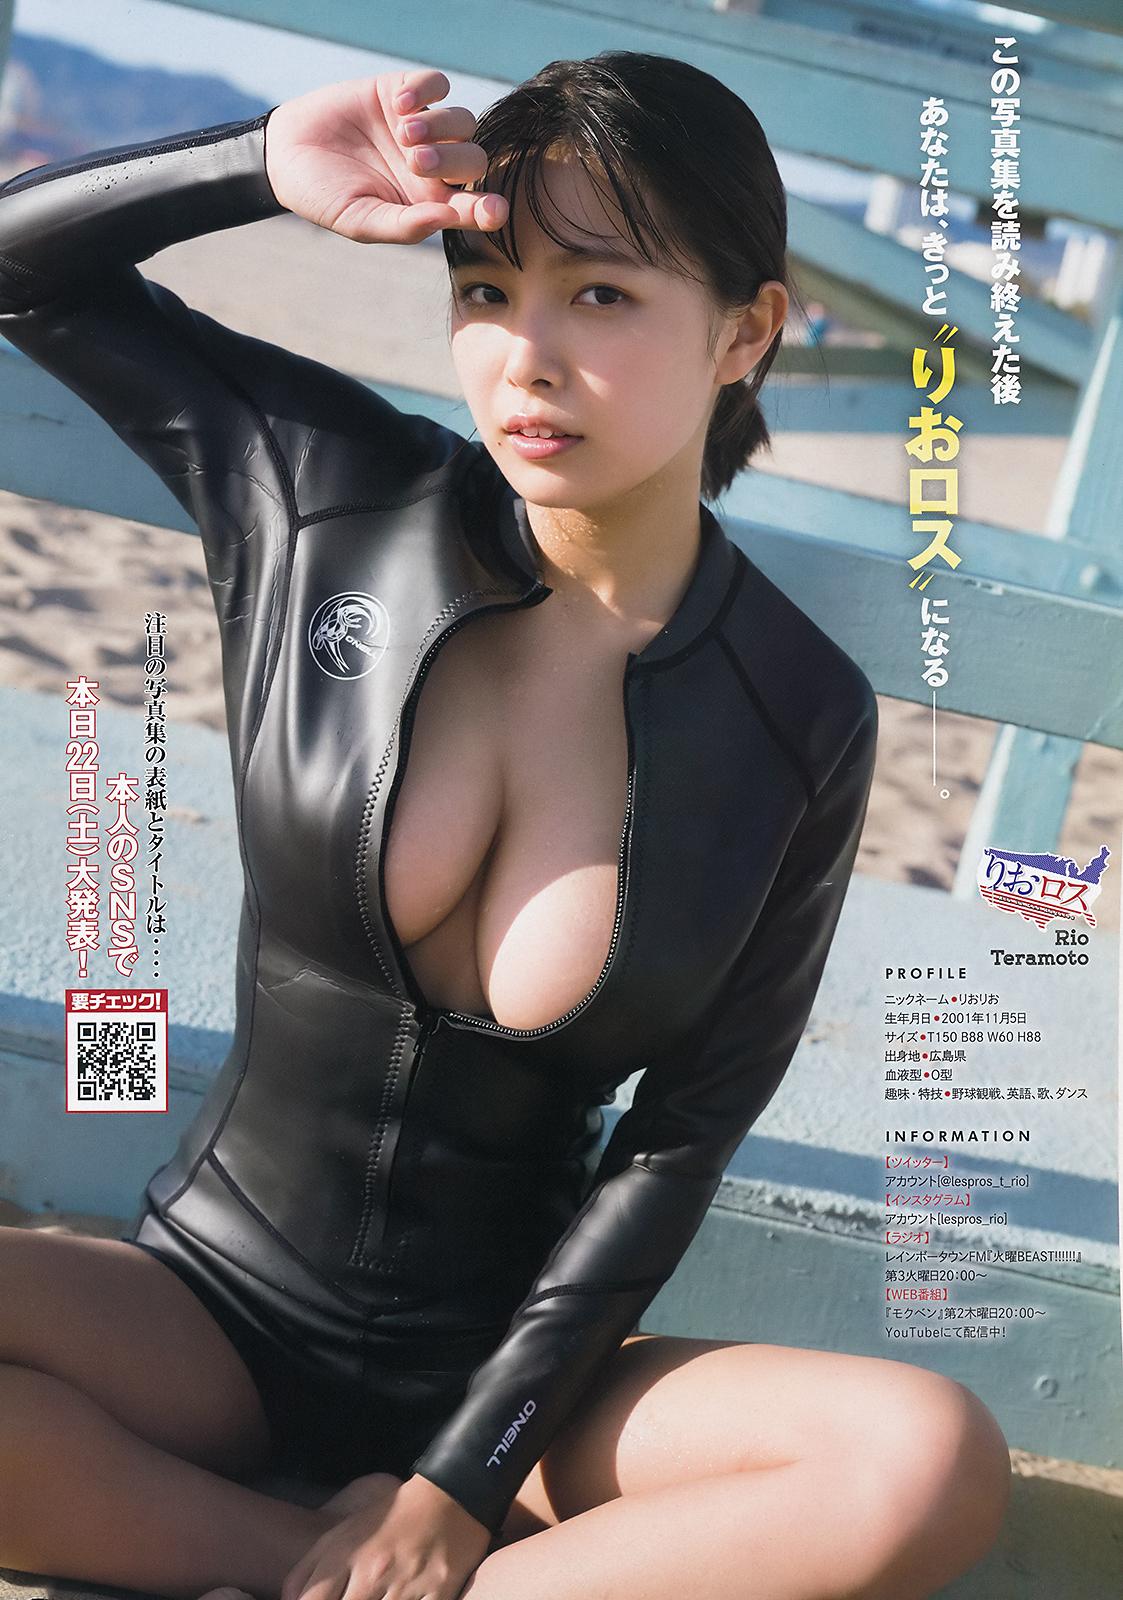 Teramoto Rio (寺本莉緒), Young Magazine